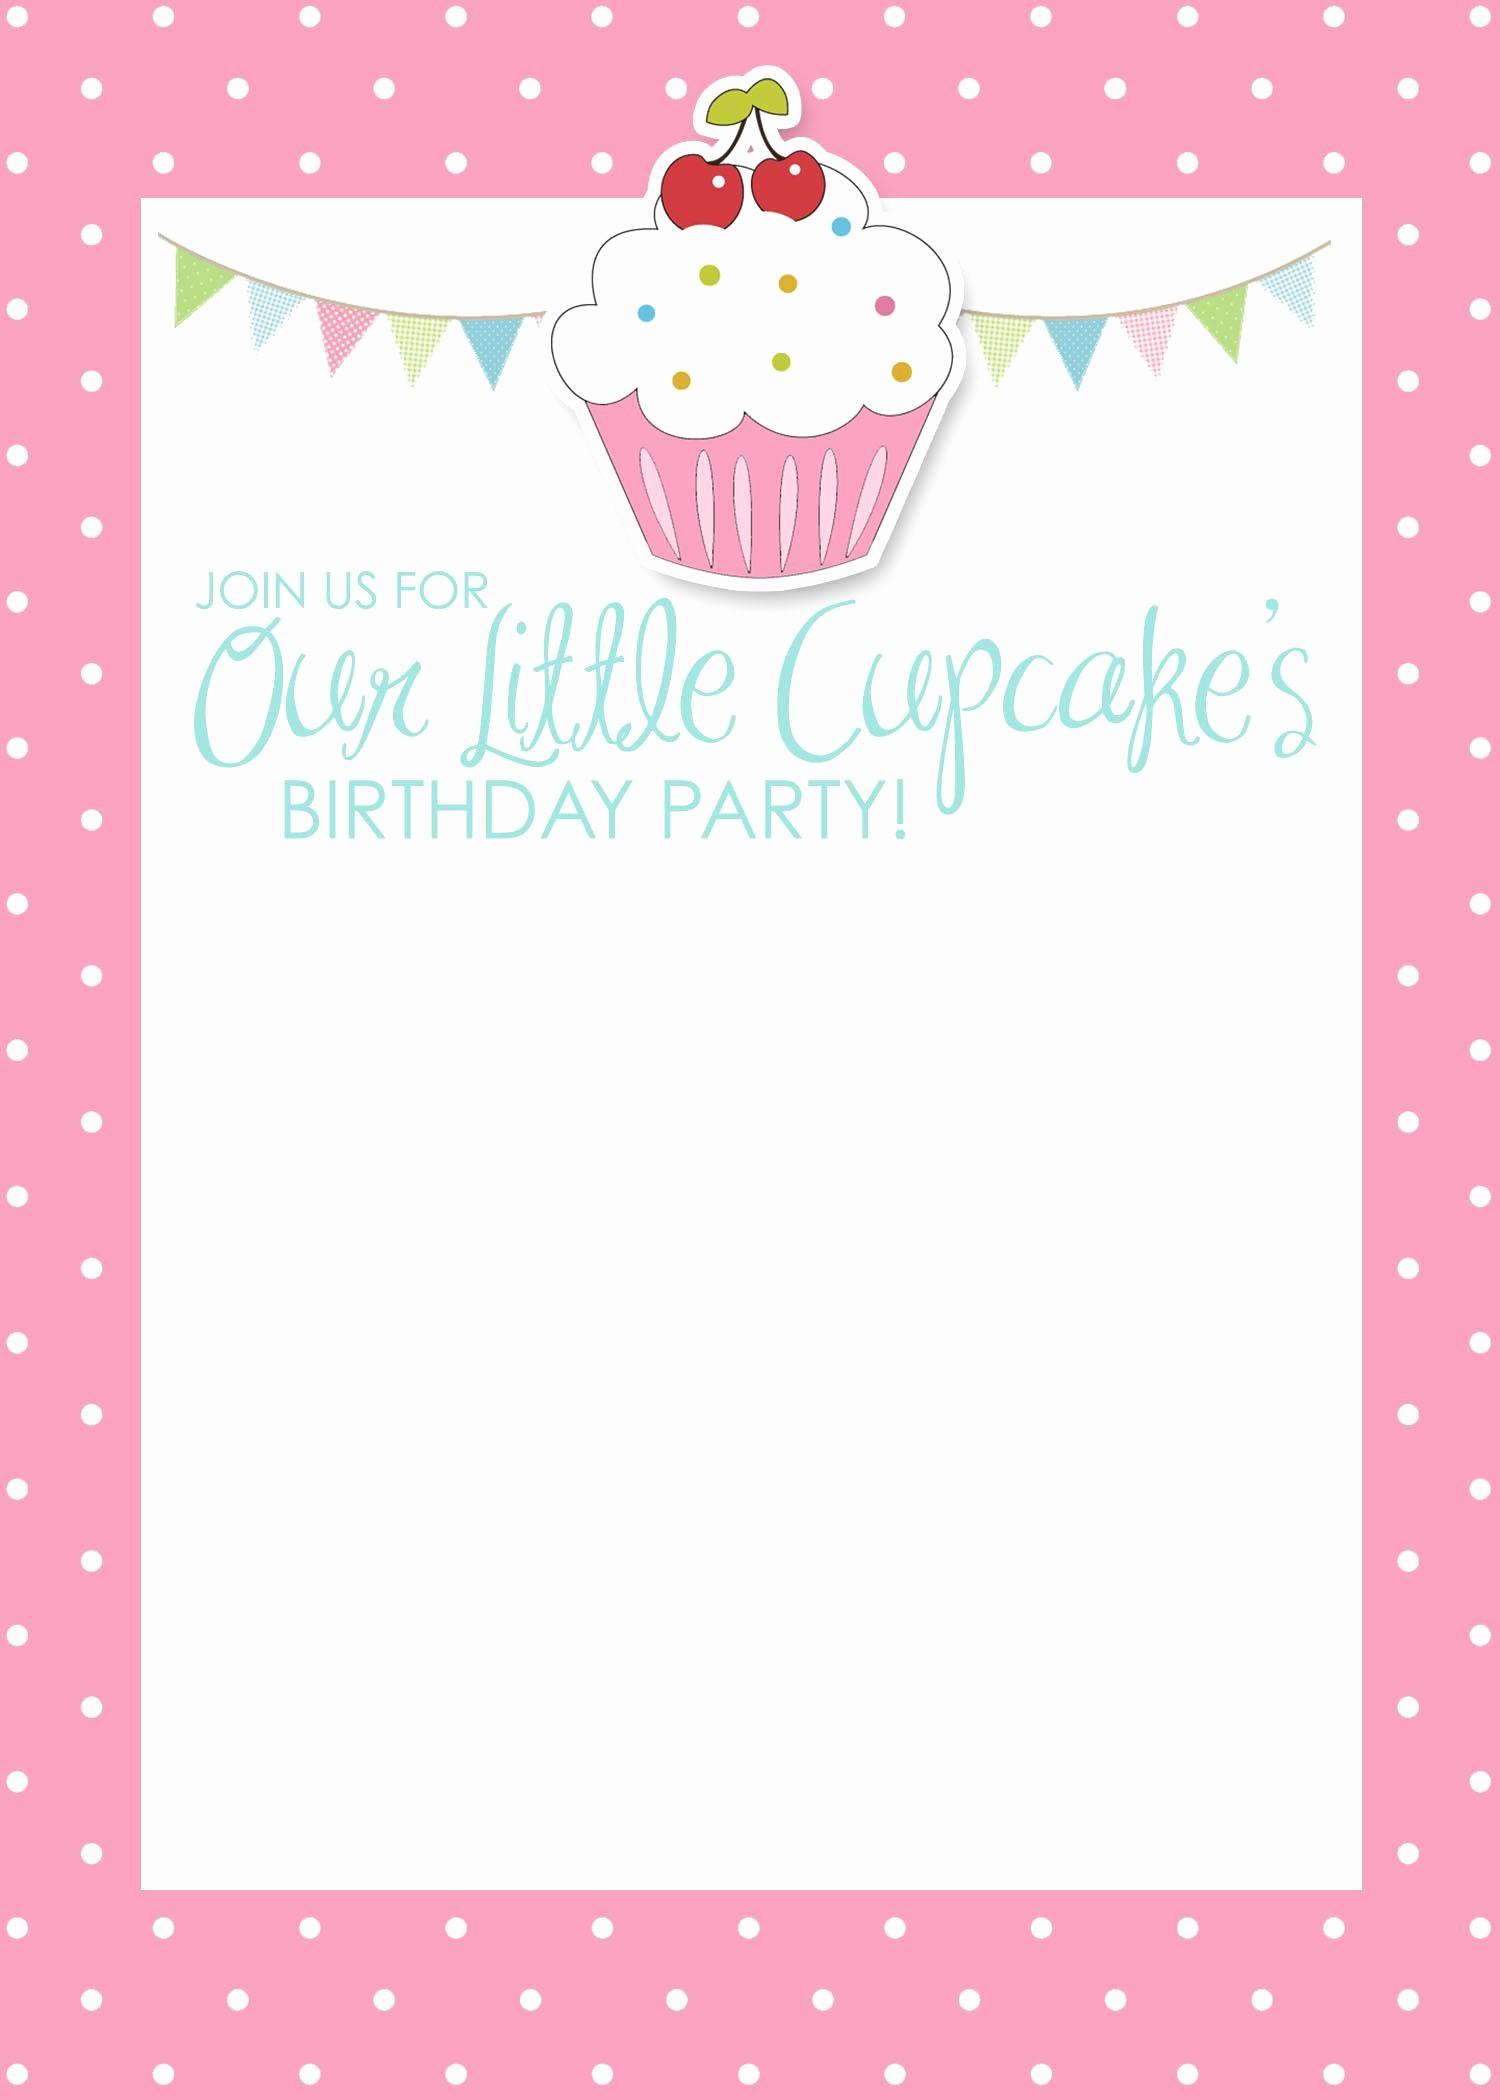 Free Templates for Birthday Invitations Beautiful Free Printable Party Invitations Templates